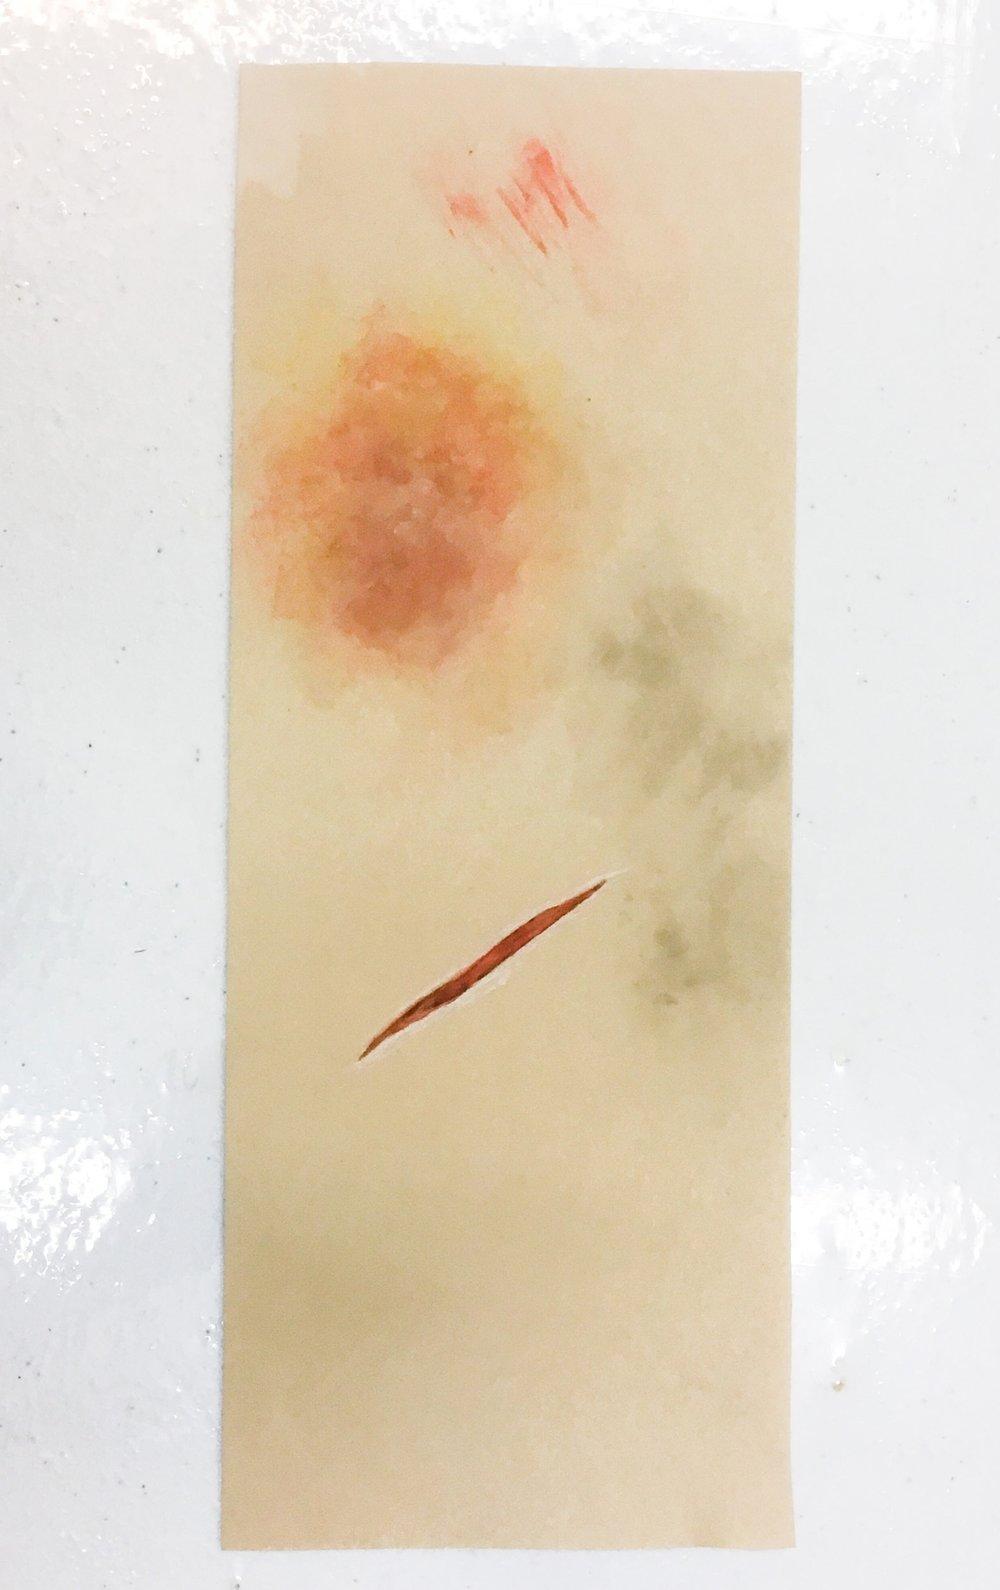 Use of moulage on ReaLifeSim skin. Courtesy of Stephanie at Moulage Sciences & Training, LLC